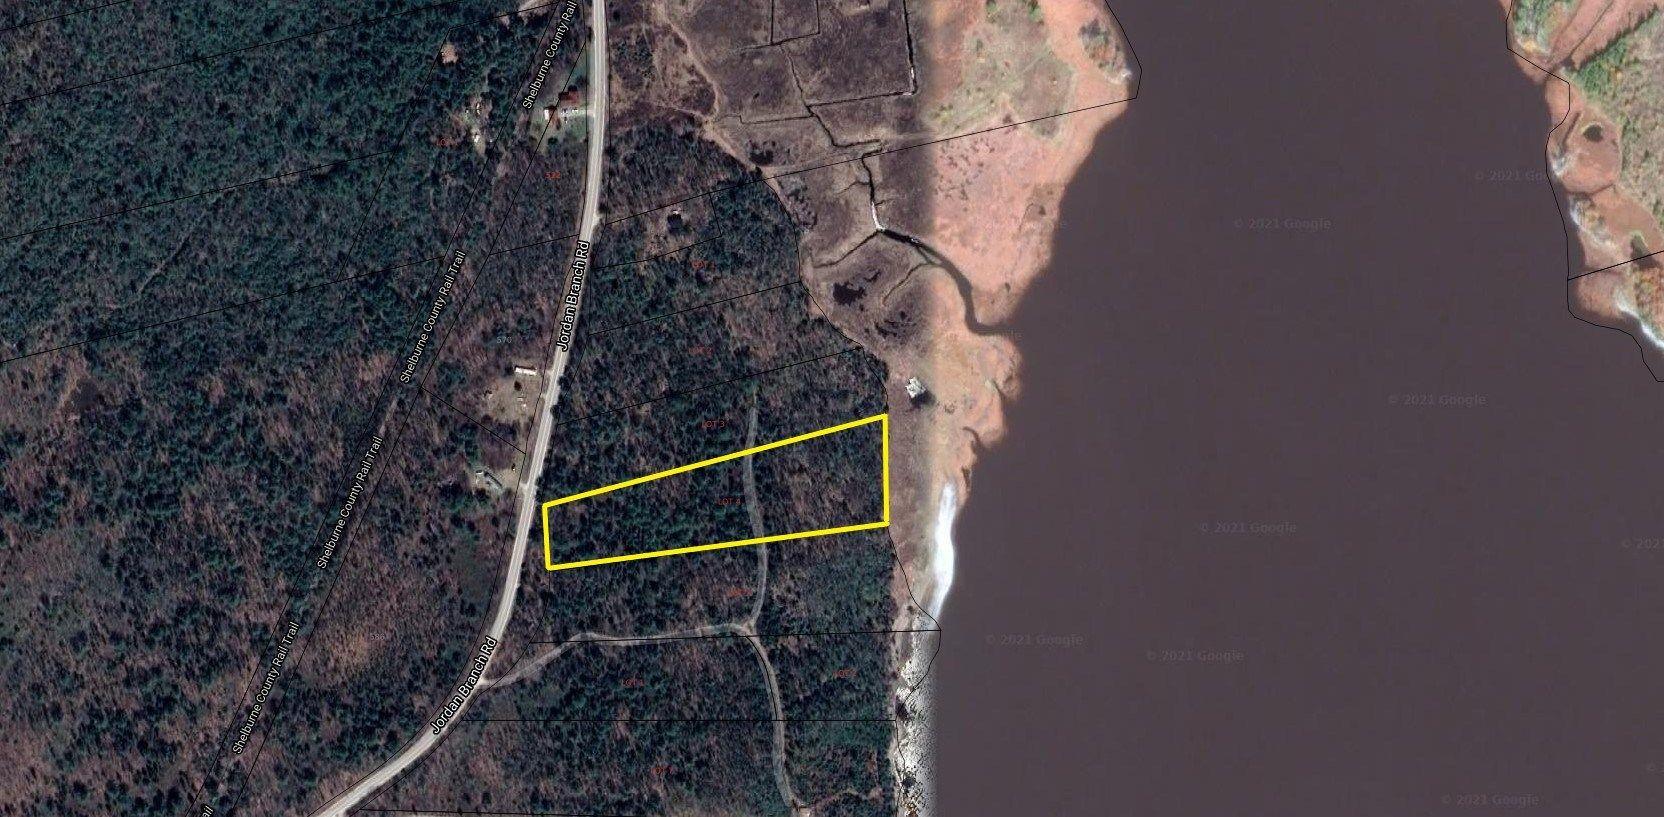 Main Photo: Lot 4 Jordan Branch Road in Jordan Branch: 407-Shelburne County Vacant Land for sale (South Shore)  : MLS®# 202108868